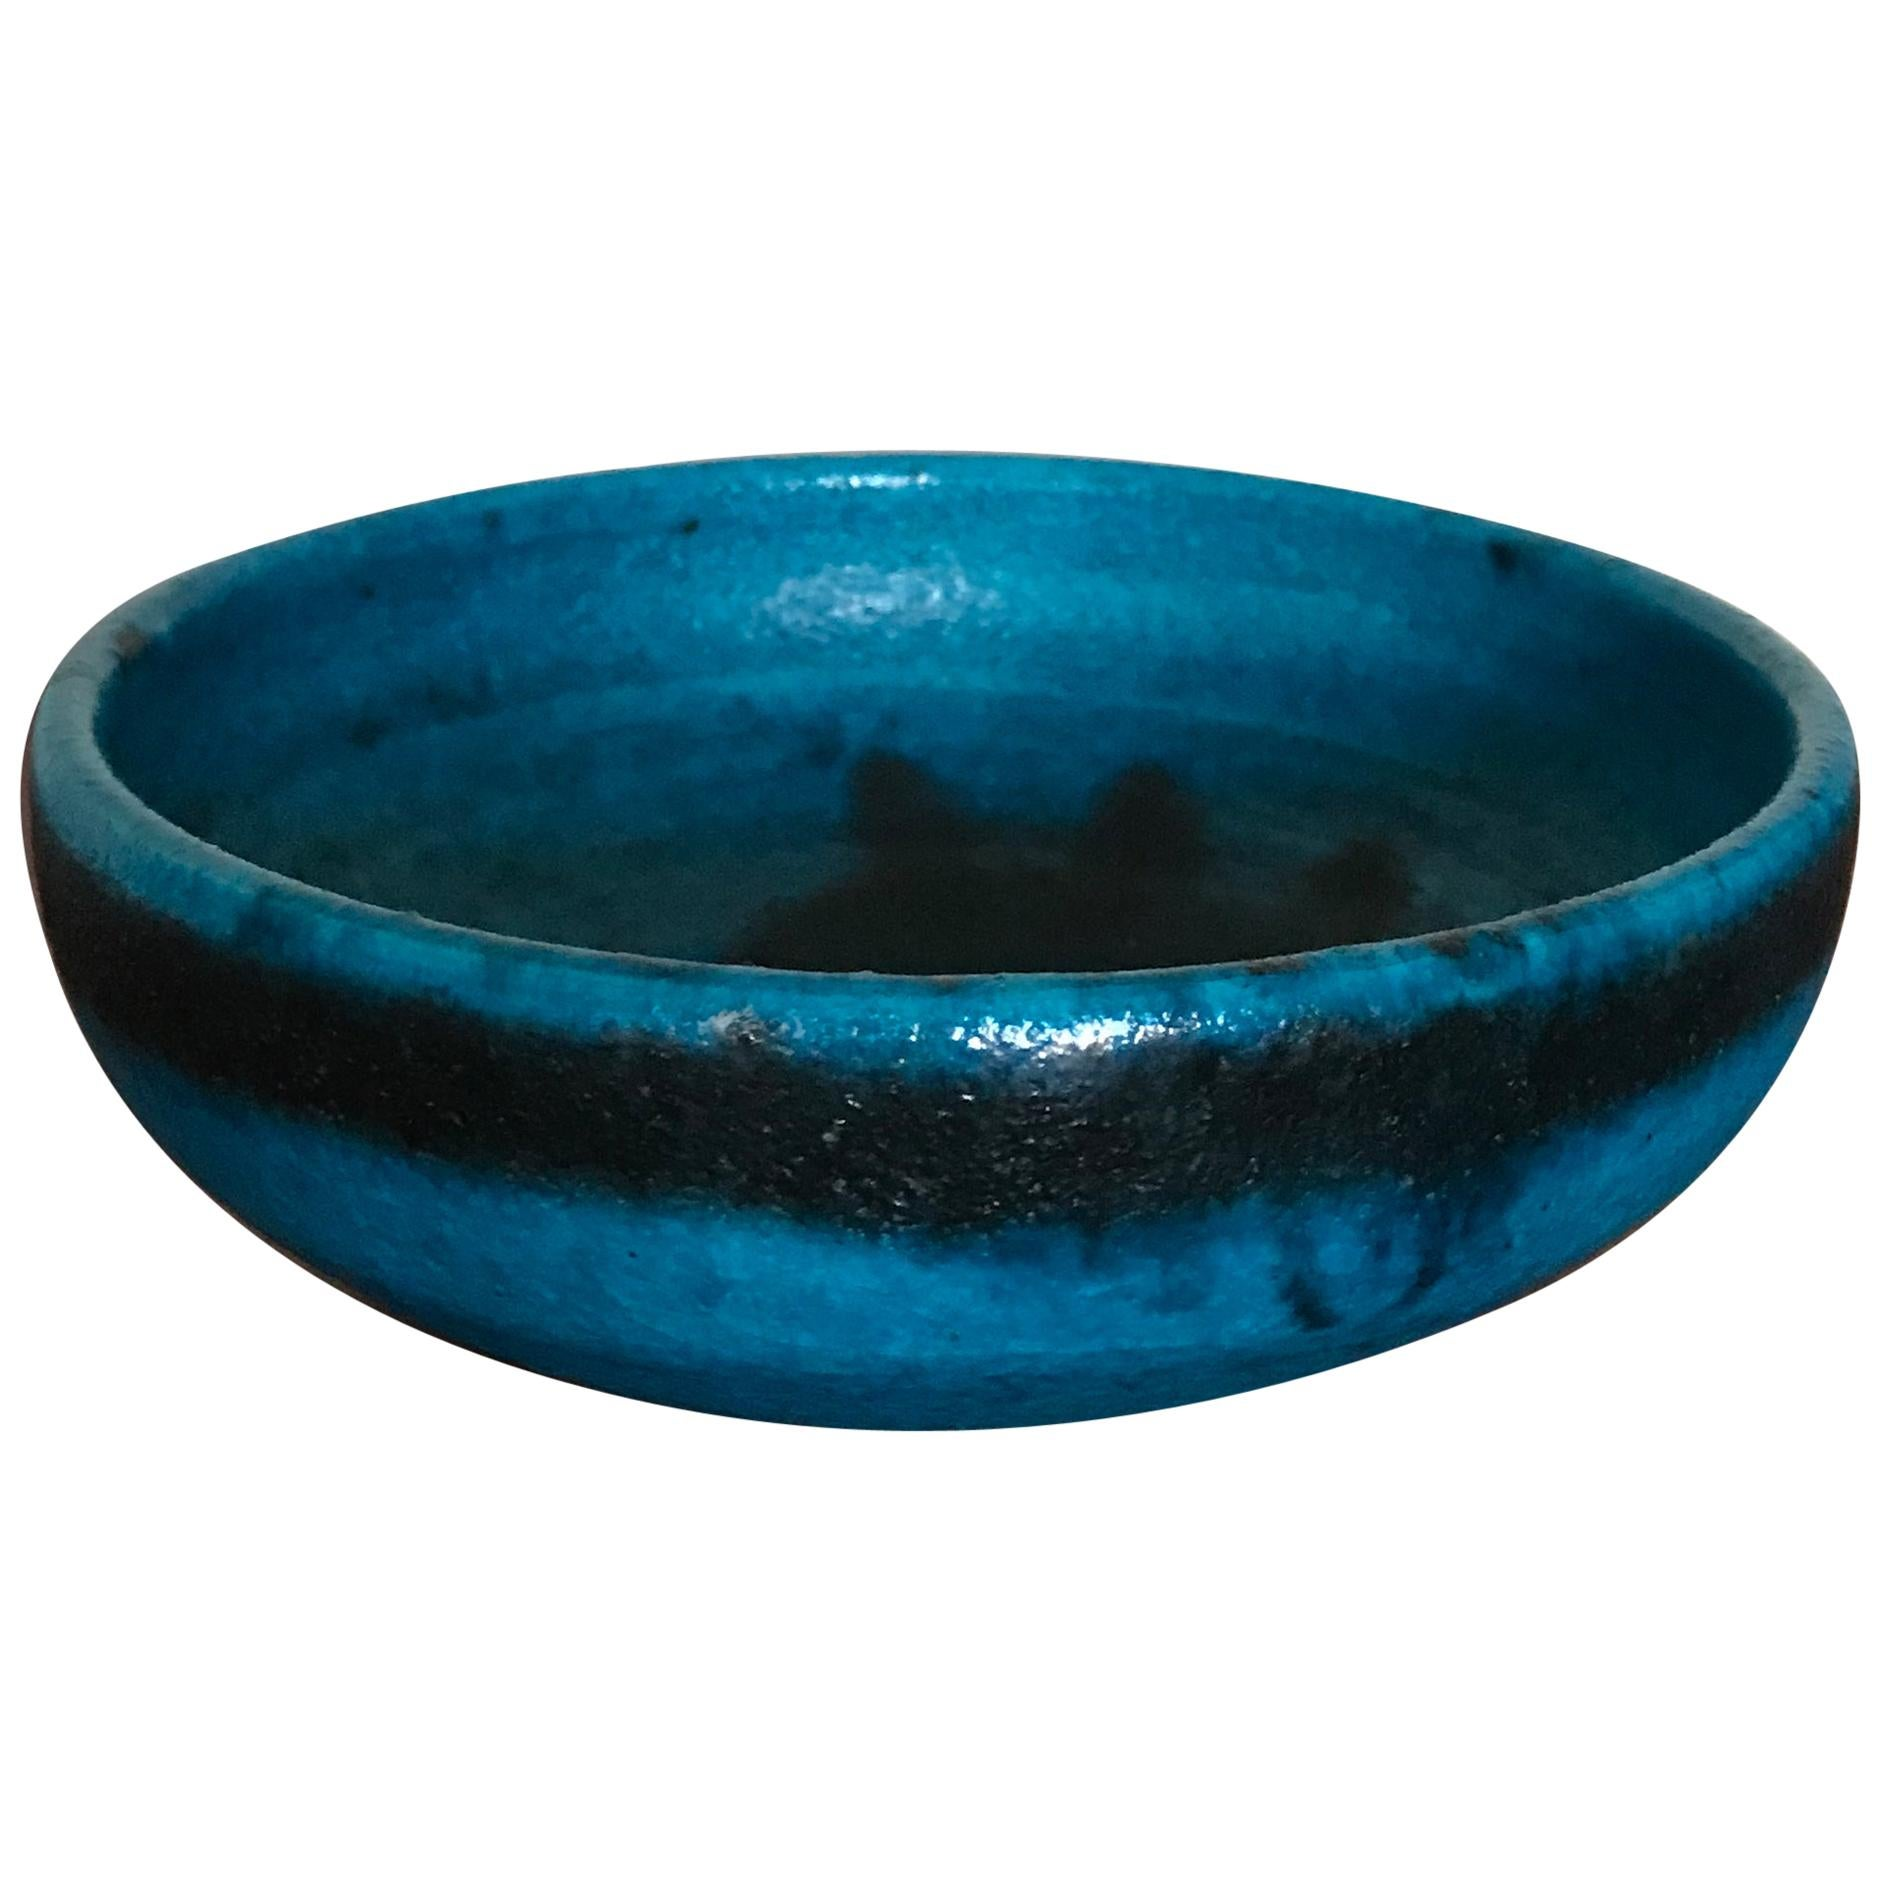 Guido Gambone Italian Mid-Century Modern Design Blue Ceramic Bowl, 1950s